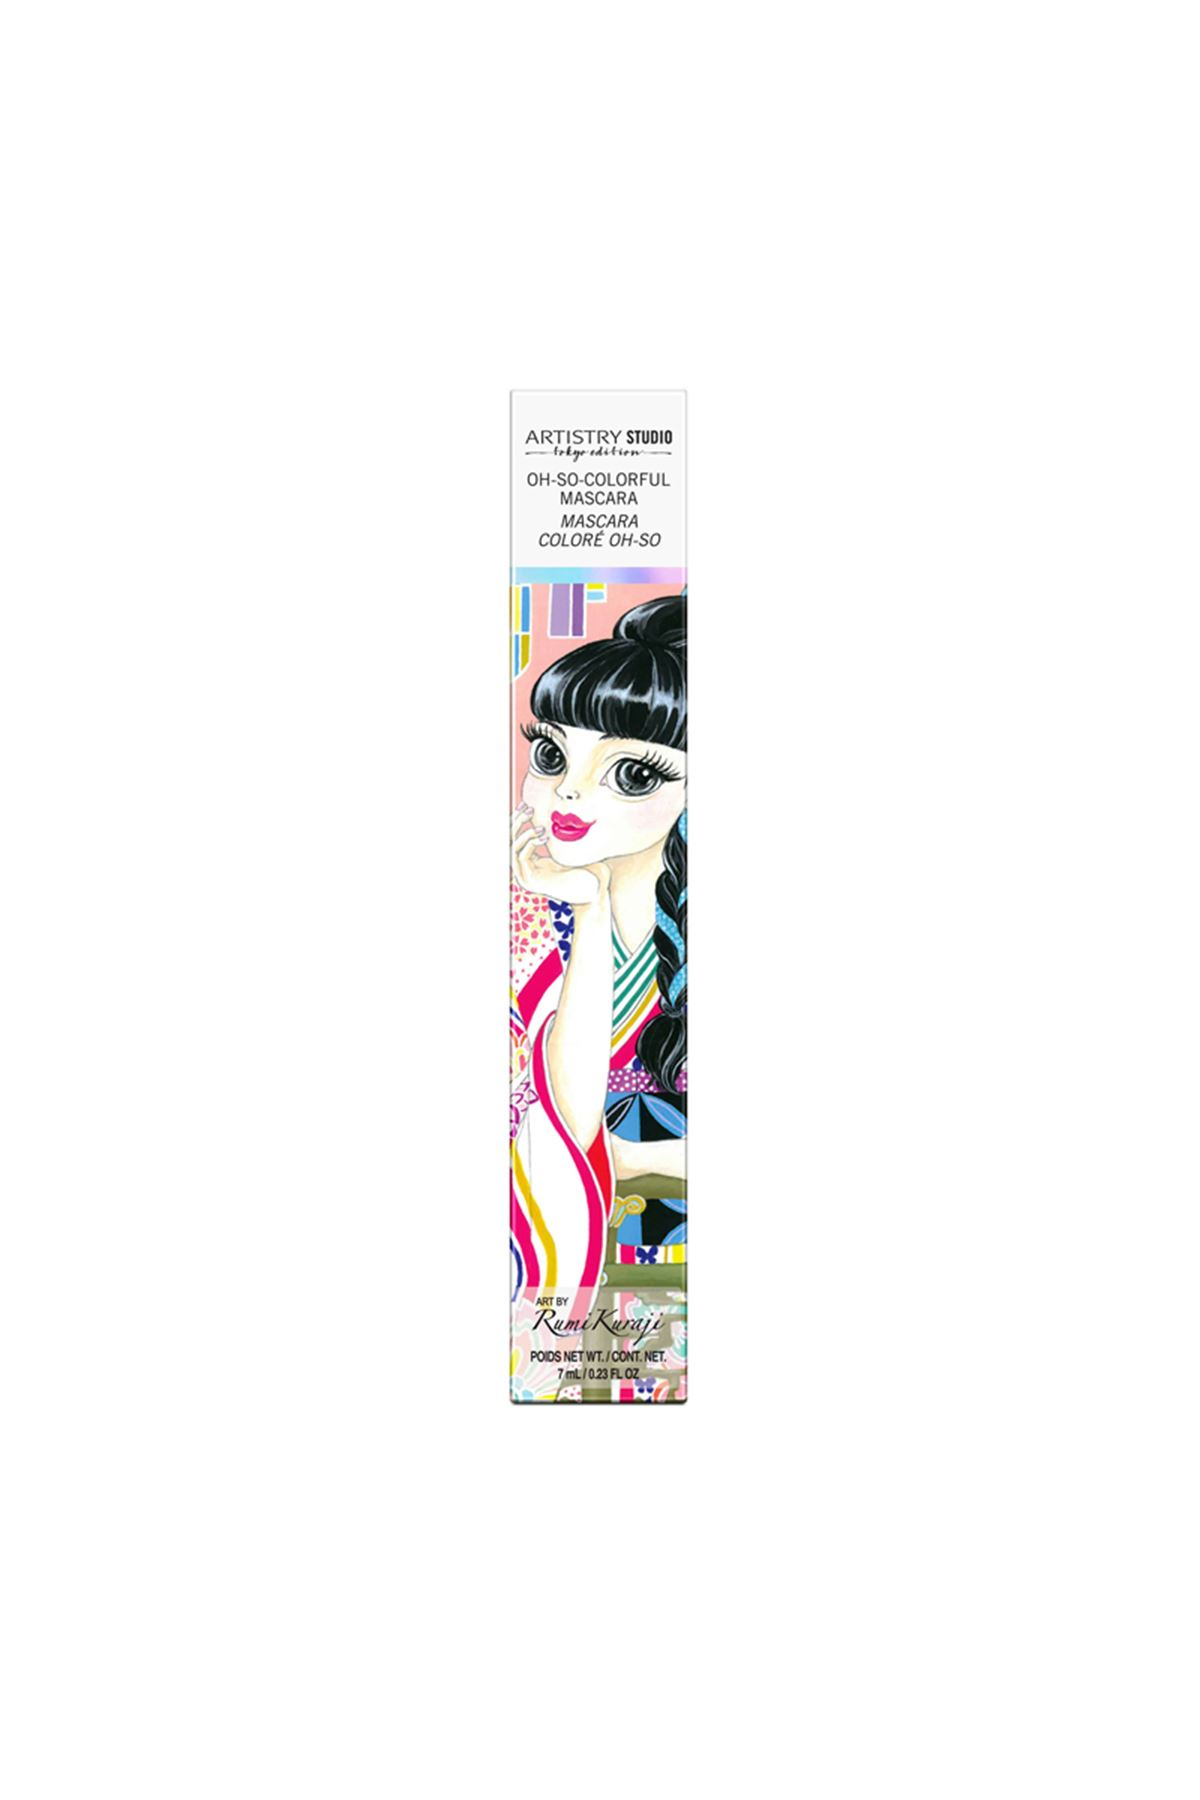 Oh-So-Colorful Maskara ARTISTRY STUDIO™ Tokyo Edition